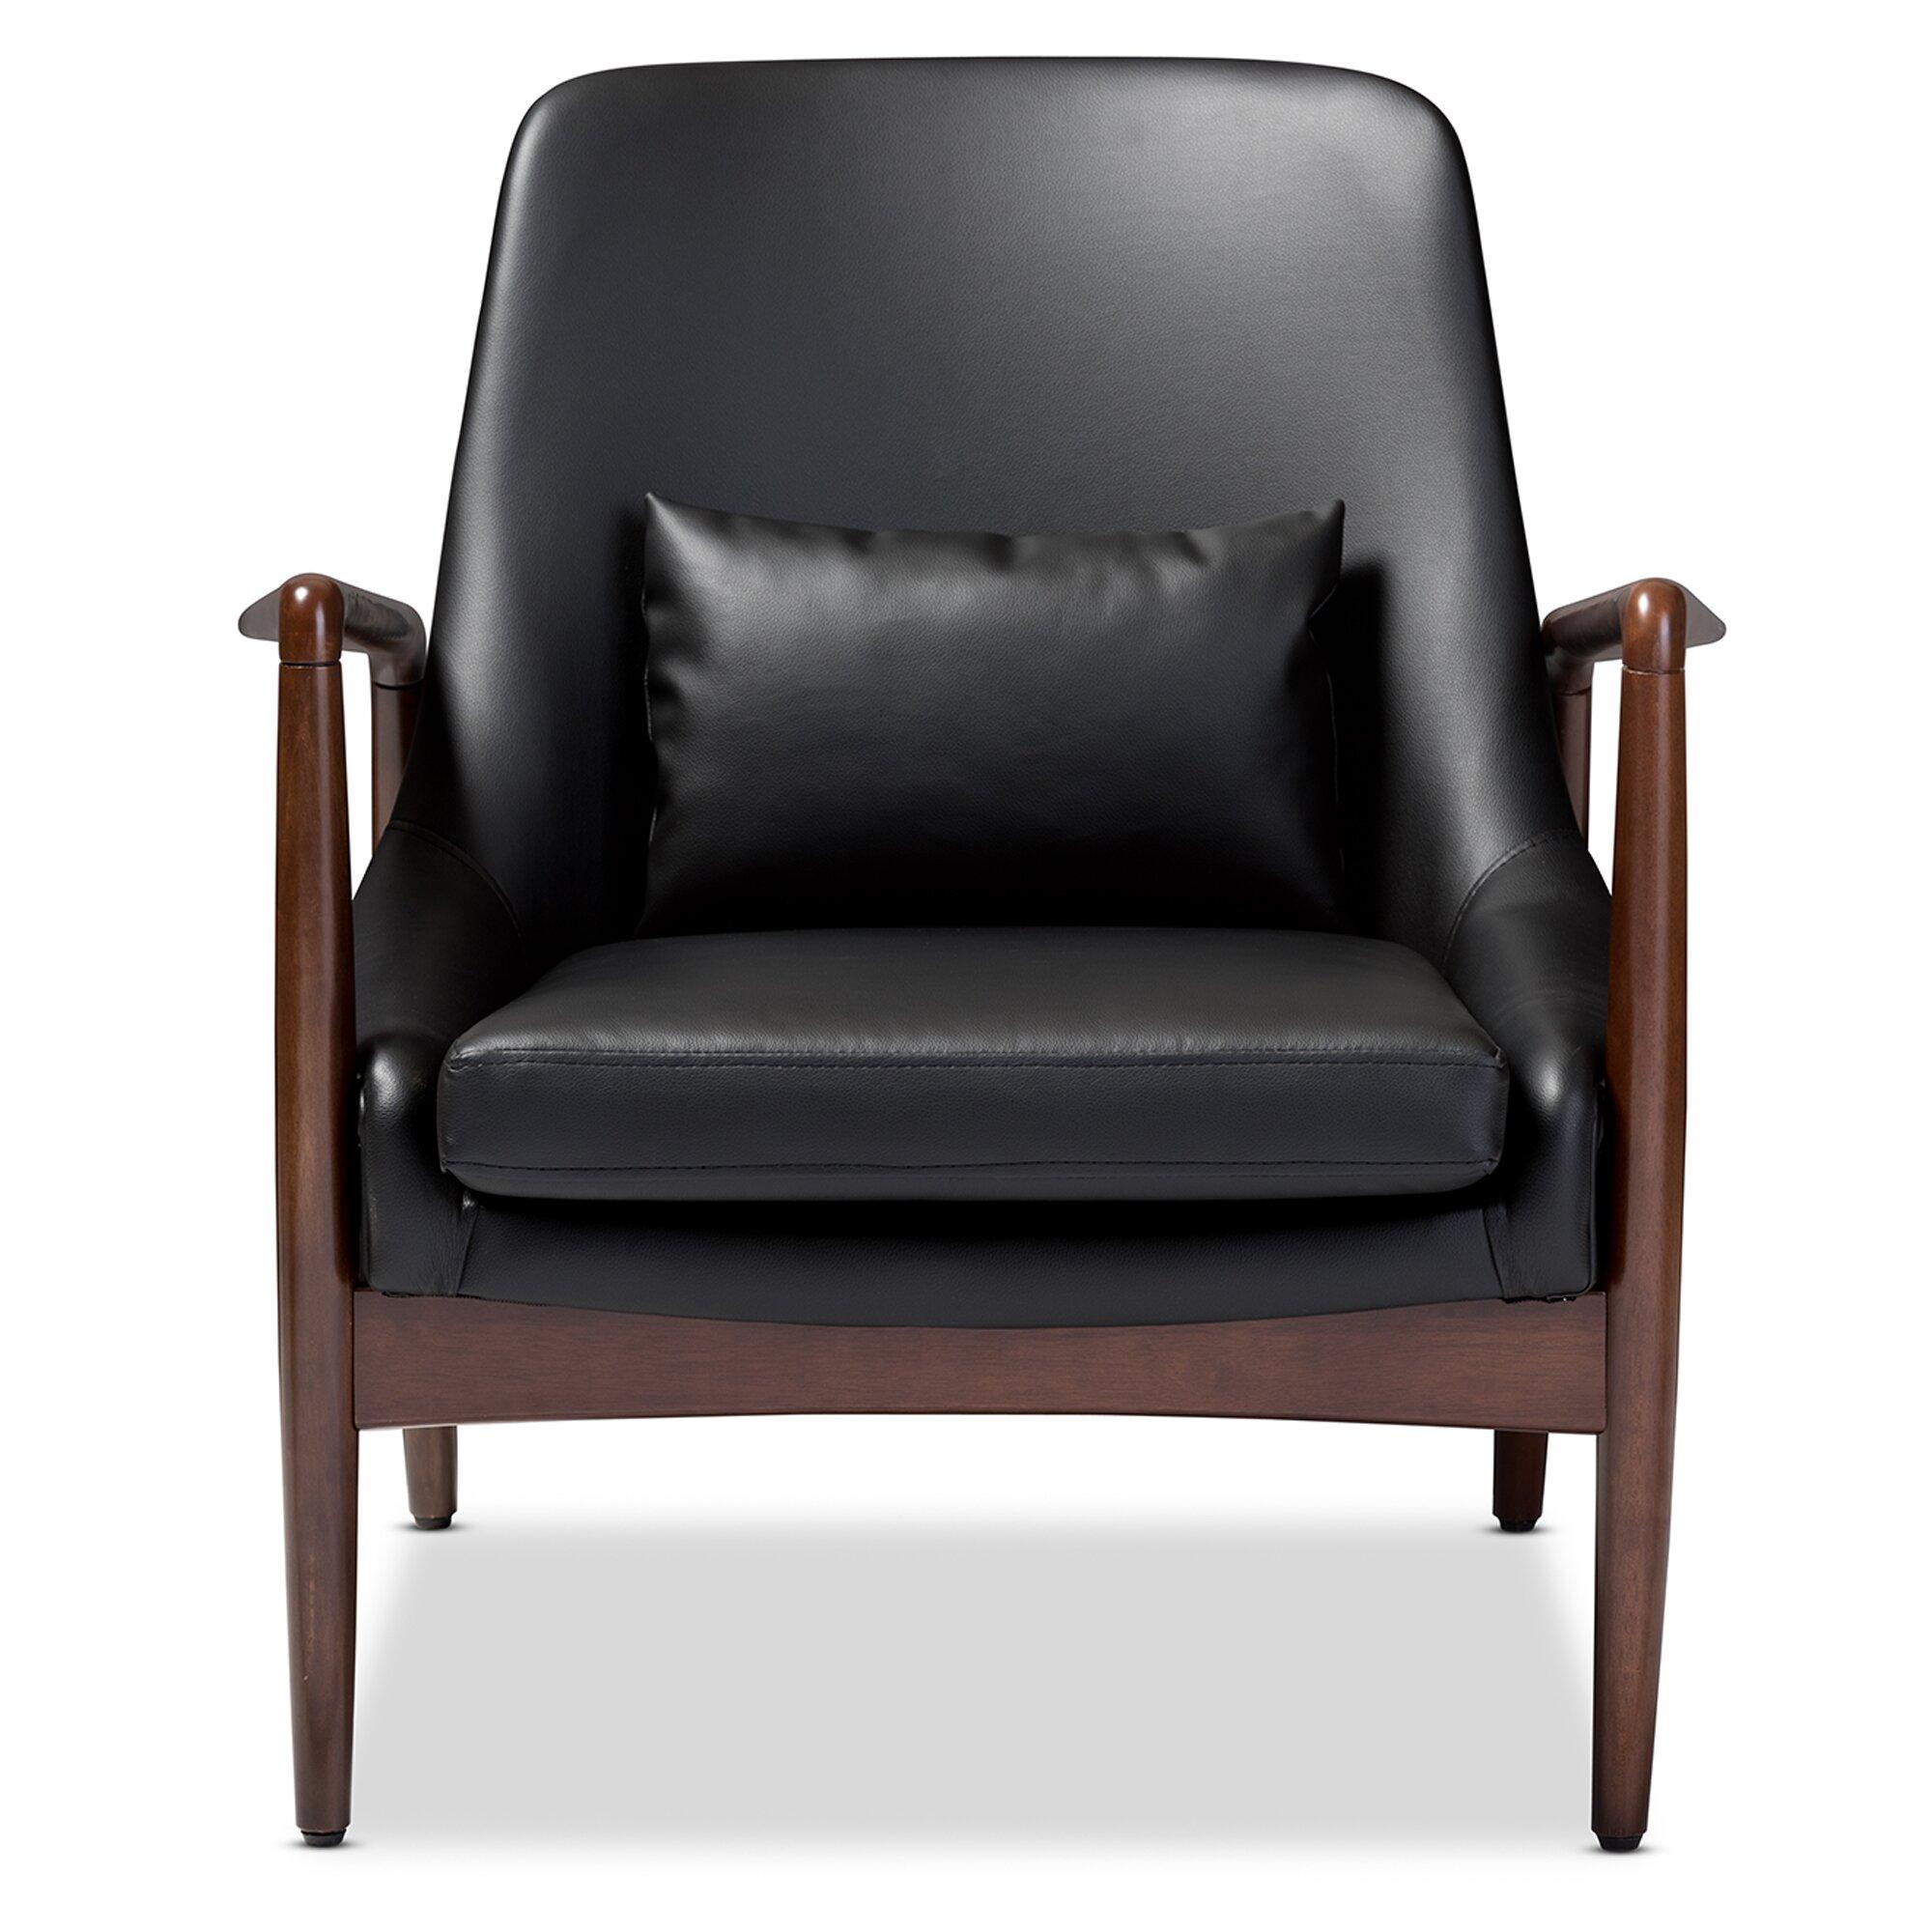 carter lounge chair wayfair. Black Bedroom Furniture Sets. Home Design Ideas